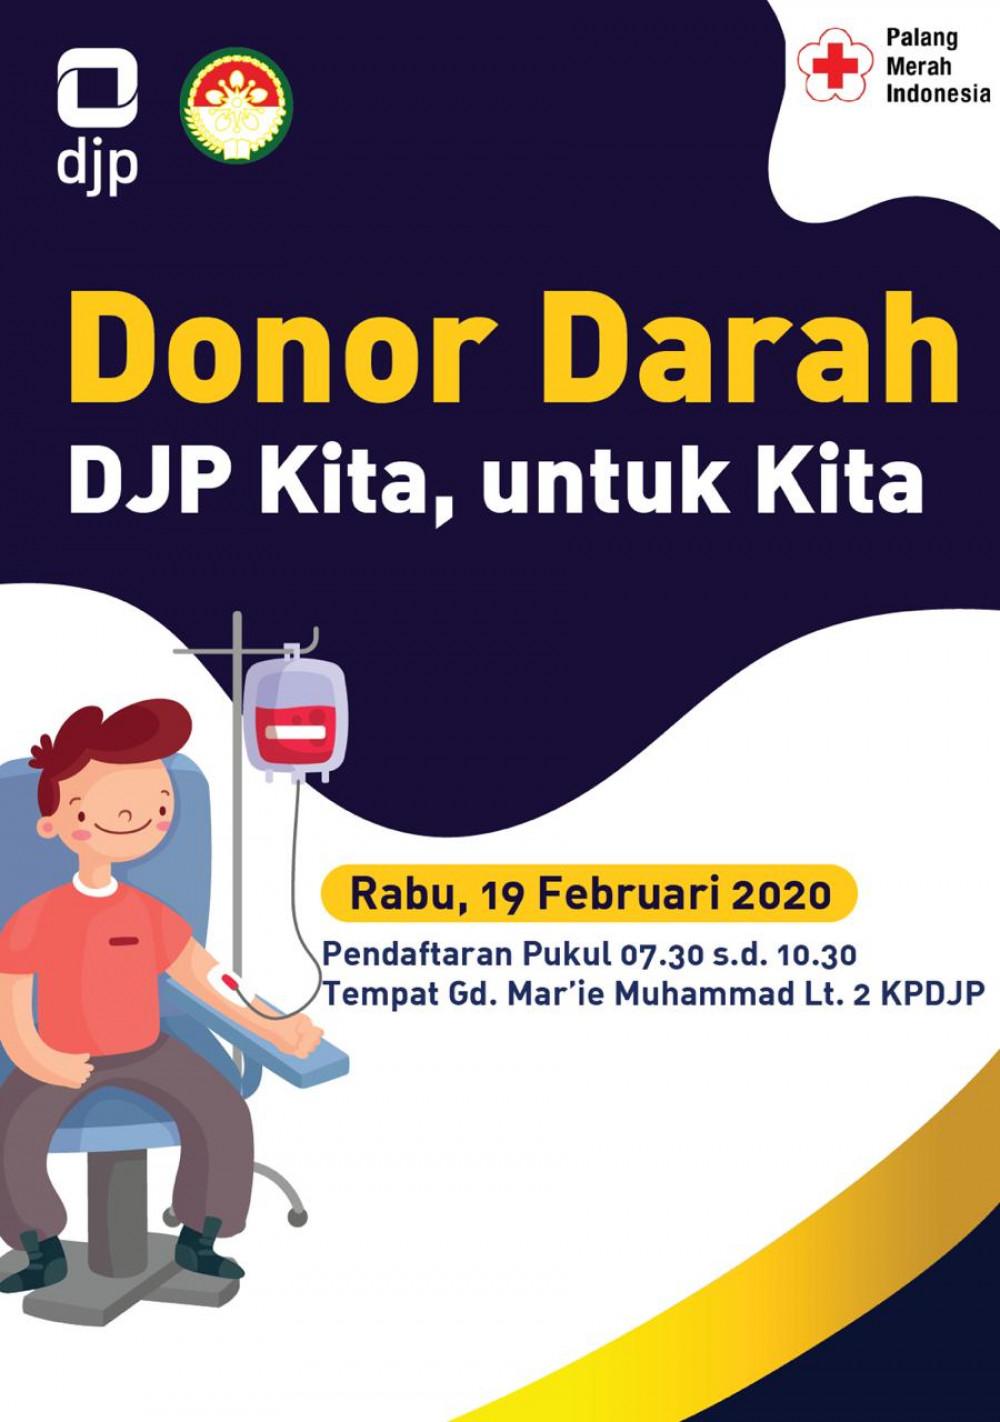 DJP Kita, Untuk Kita : Donor Darah DJP Jakarta